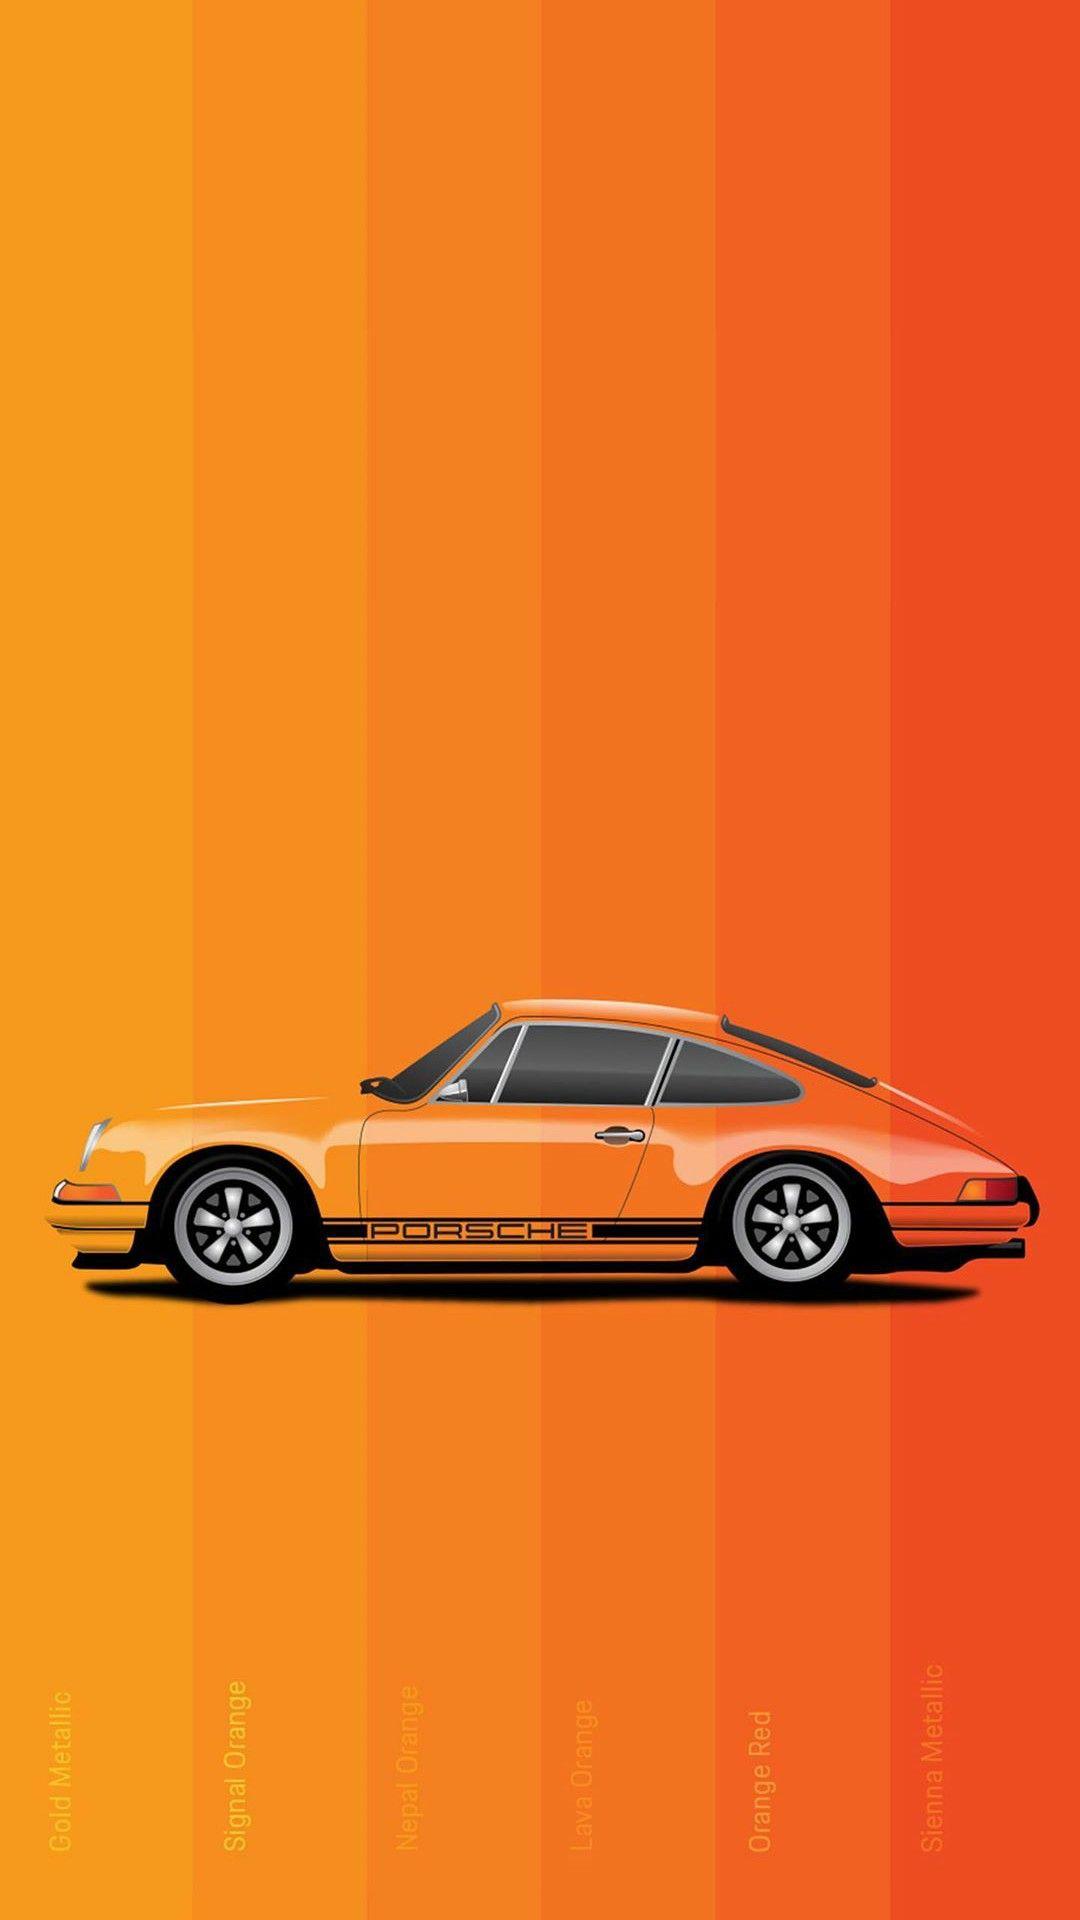 Orange Porsche Car Wallpaper 1080x1920 Car Wallpapers Car Iphone Wallpaper Porsche Cars